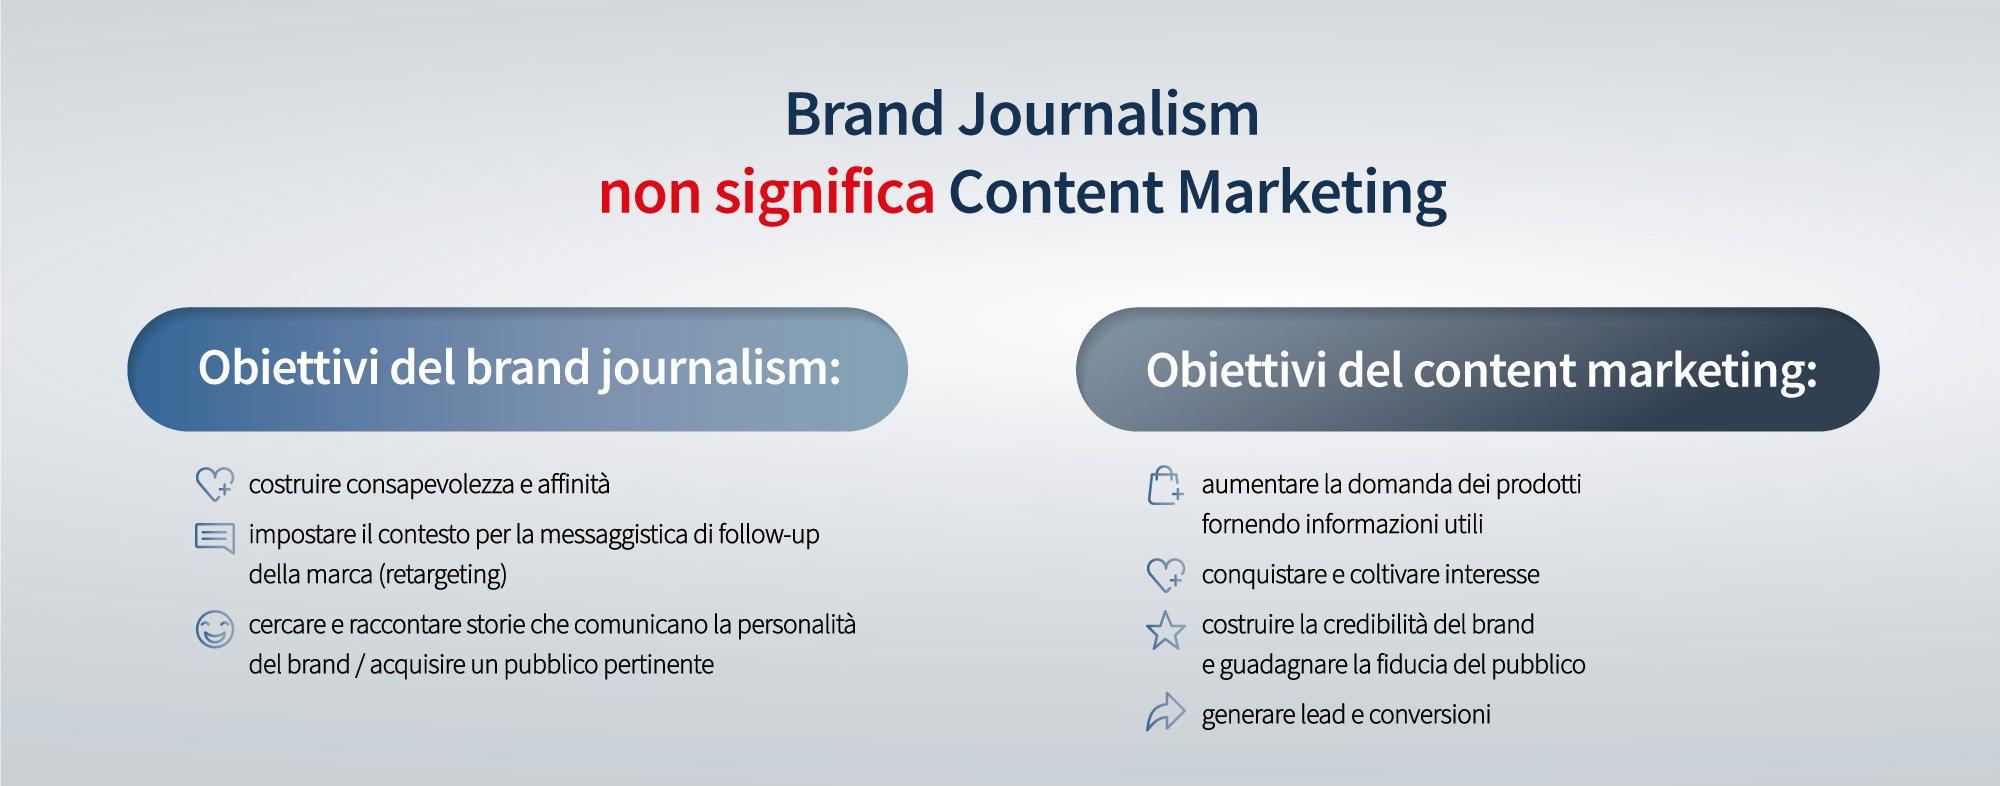 brand journalism-content marketing-obiettivi